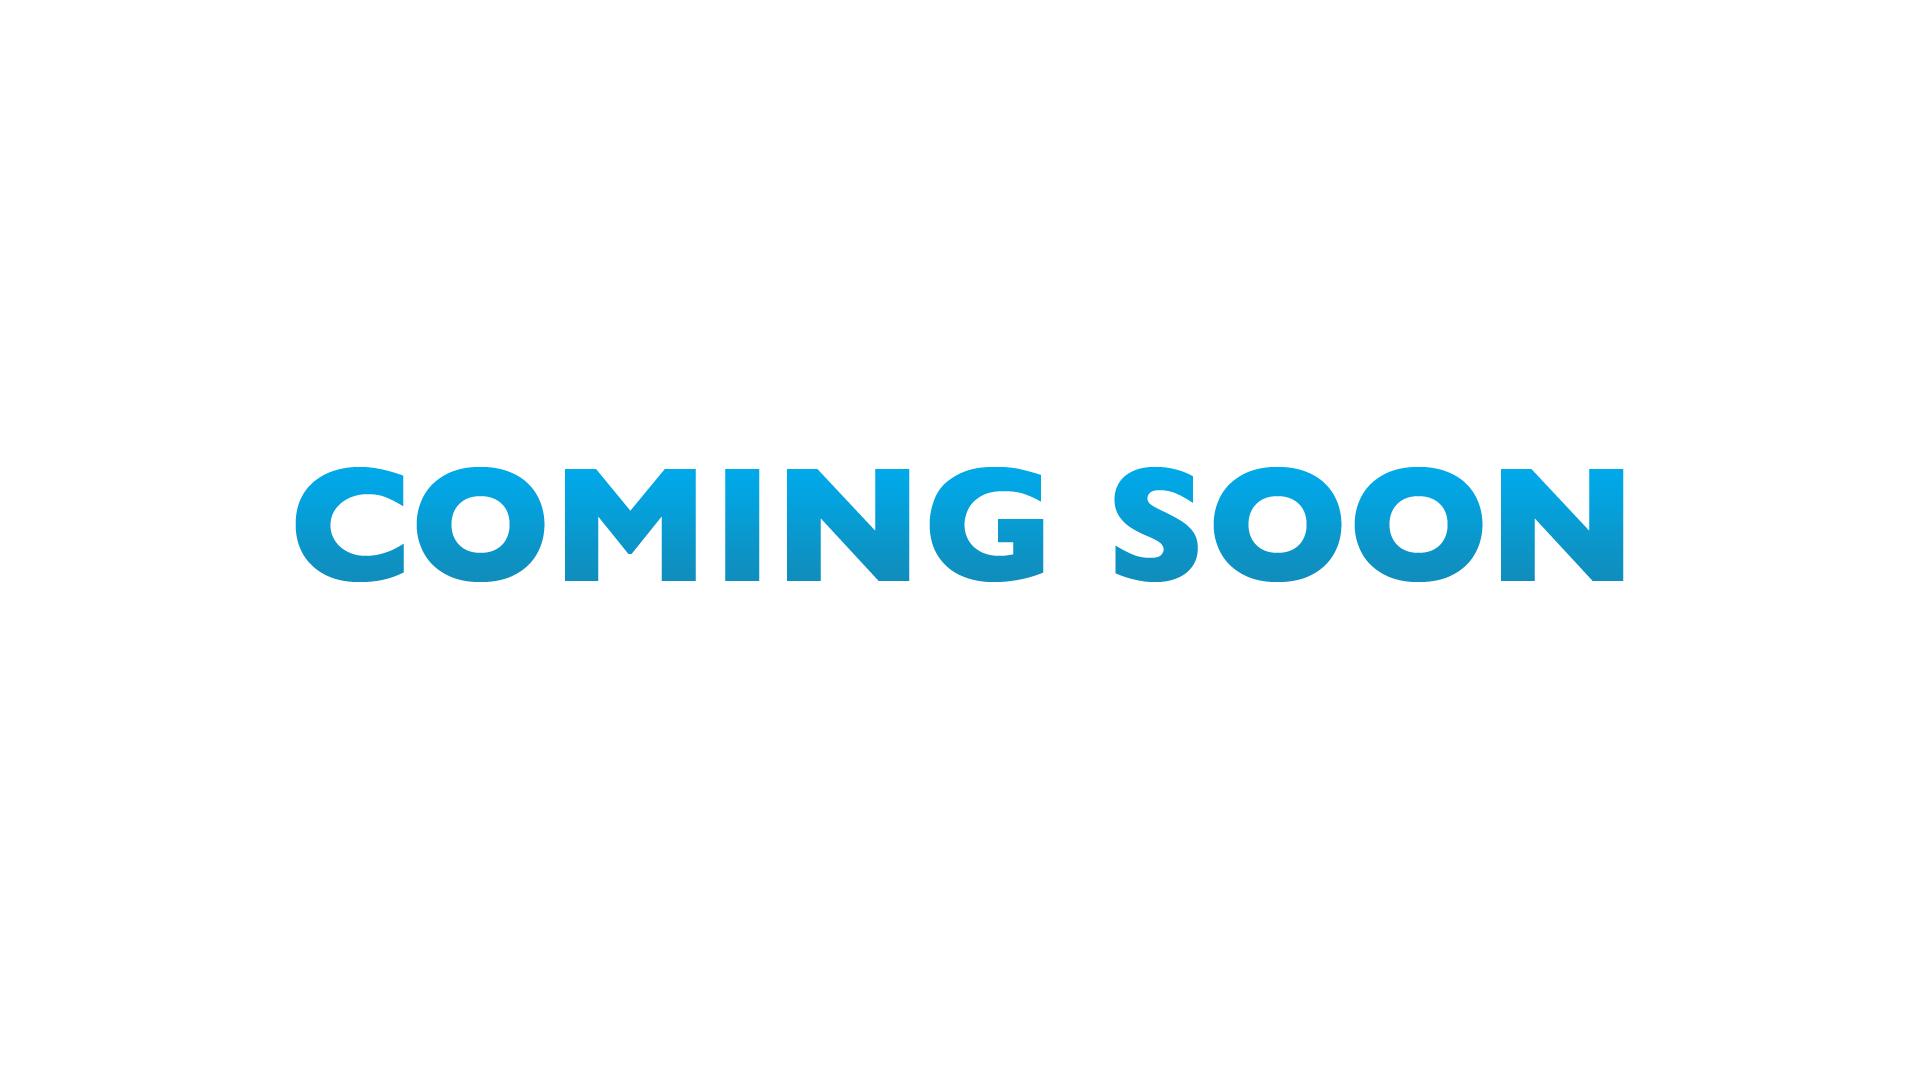 Coming Soon. Homoeopathy Clinic. Coming_soon - Coming Soon HD PNG